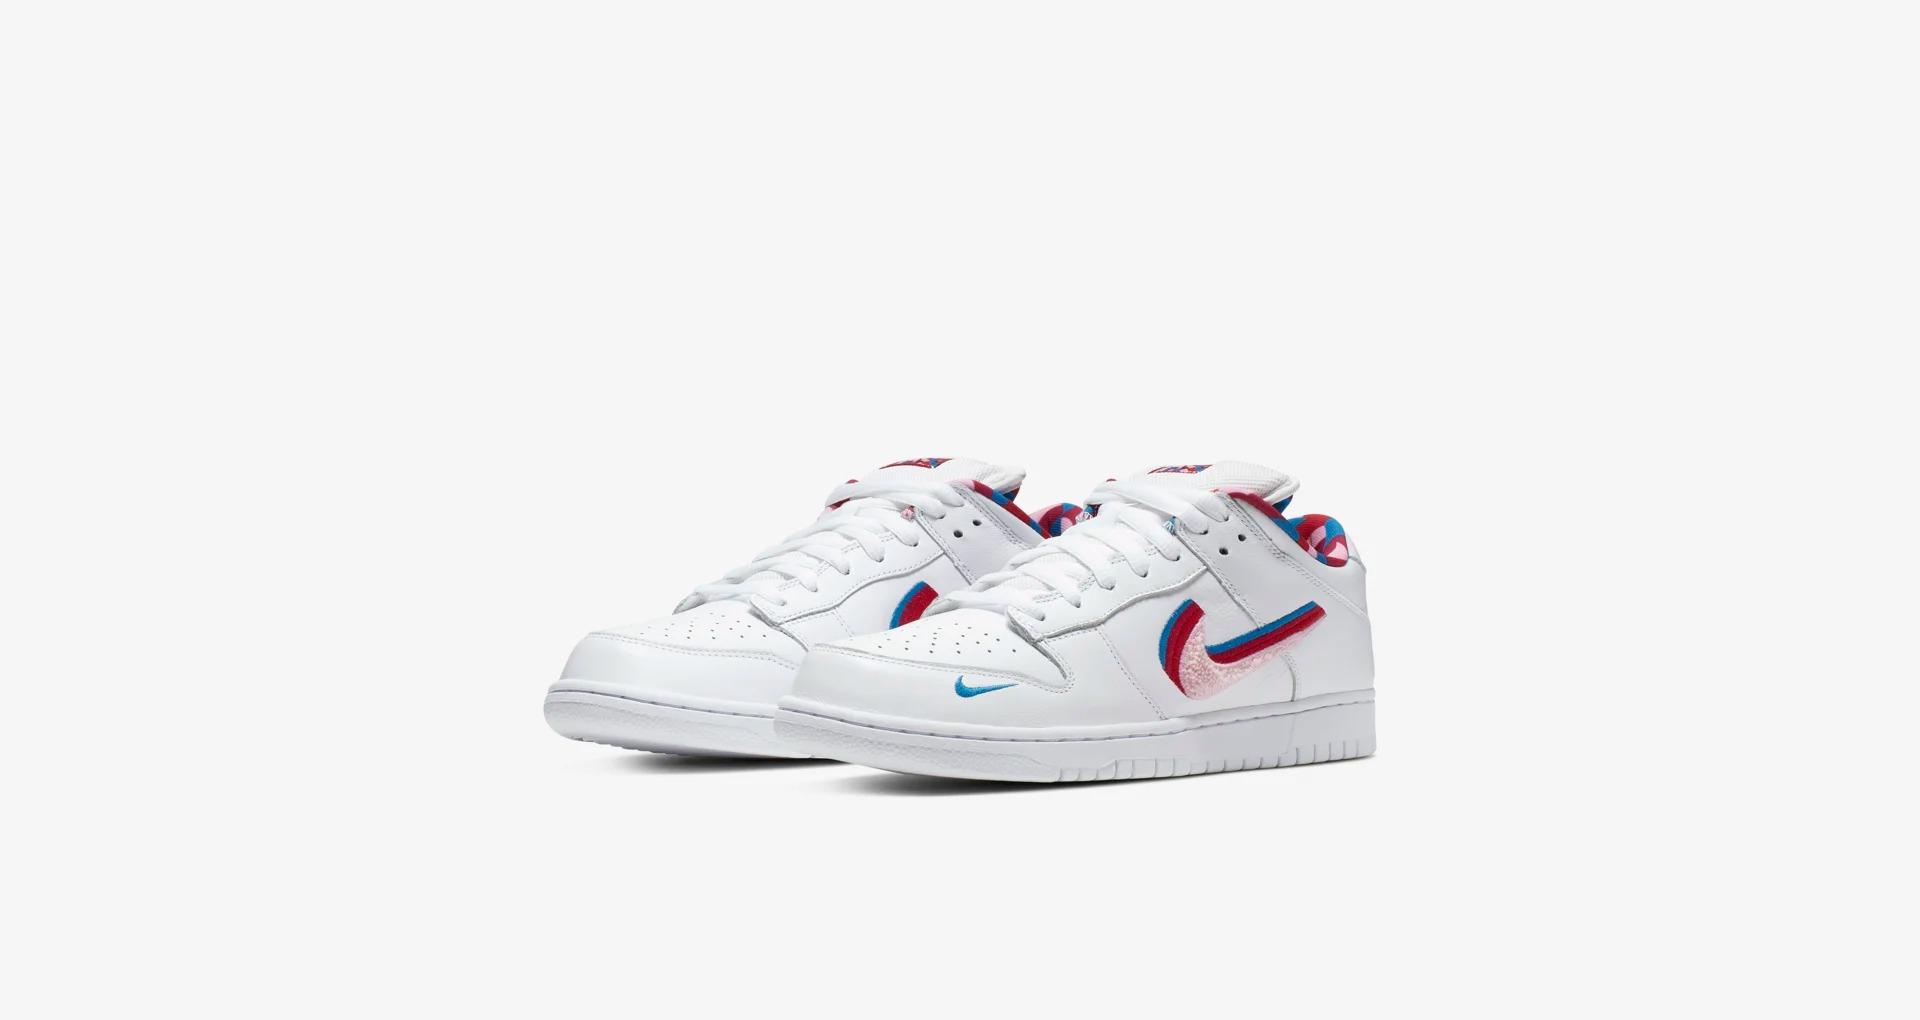 CN4504 100 Parra x Nike SB Dunk Low 4